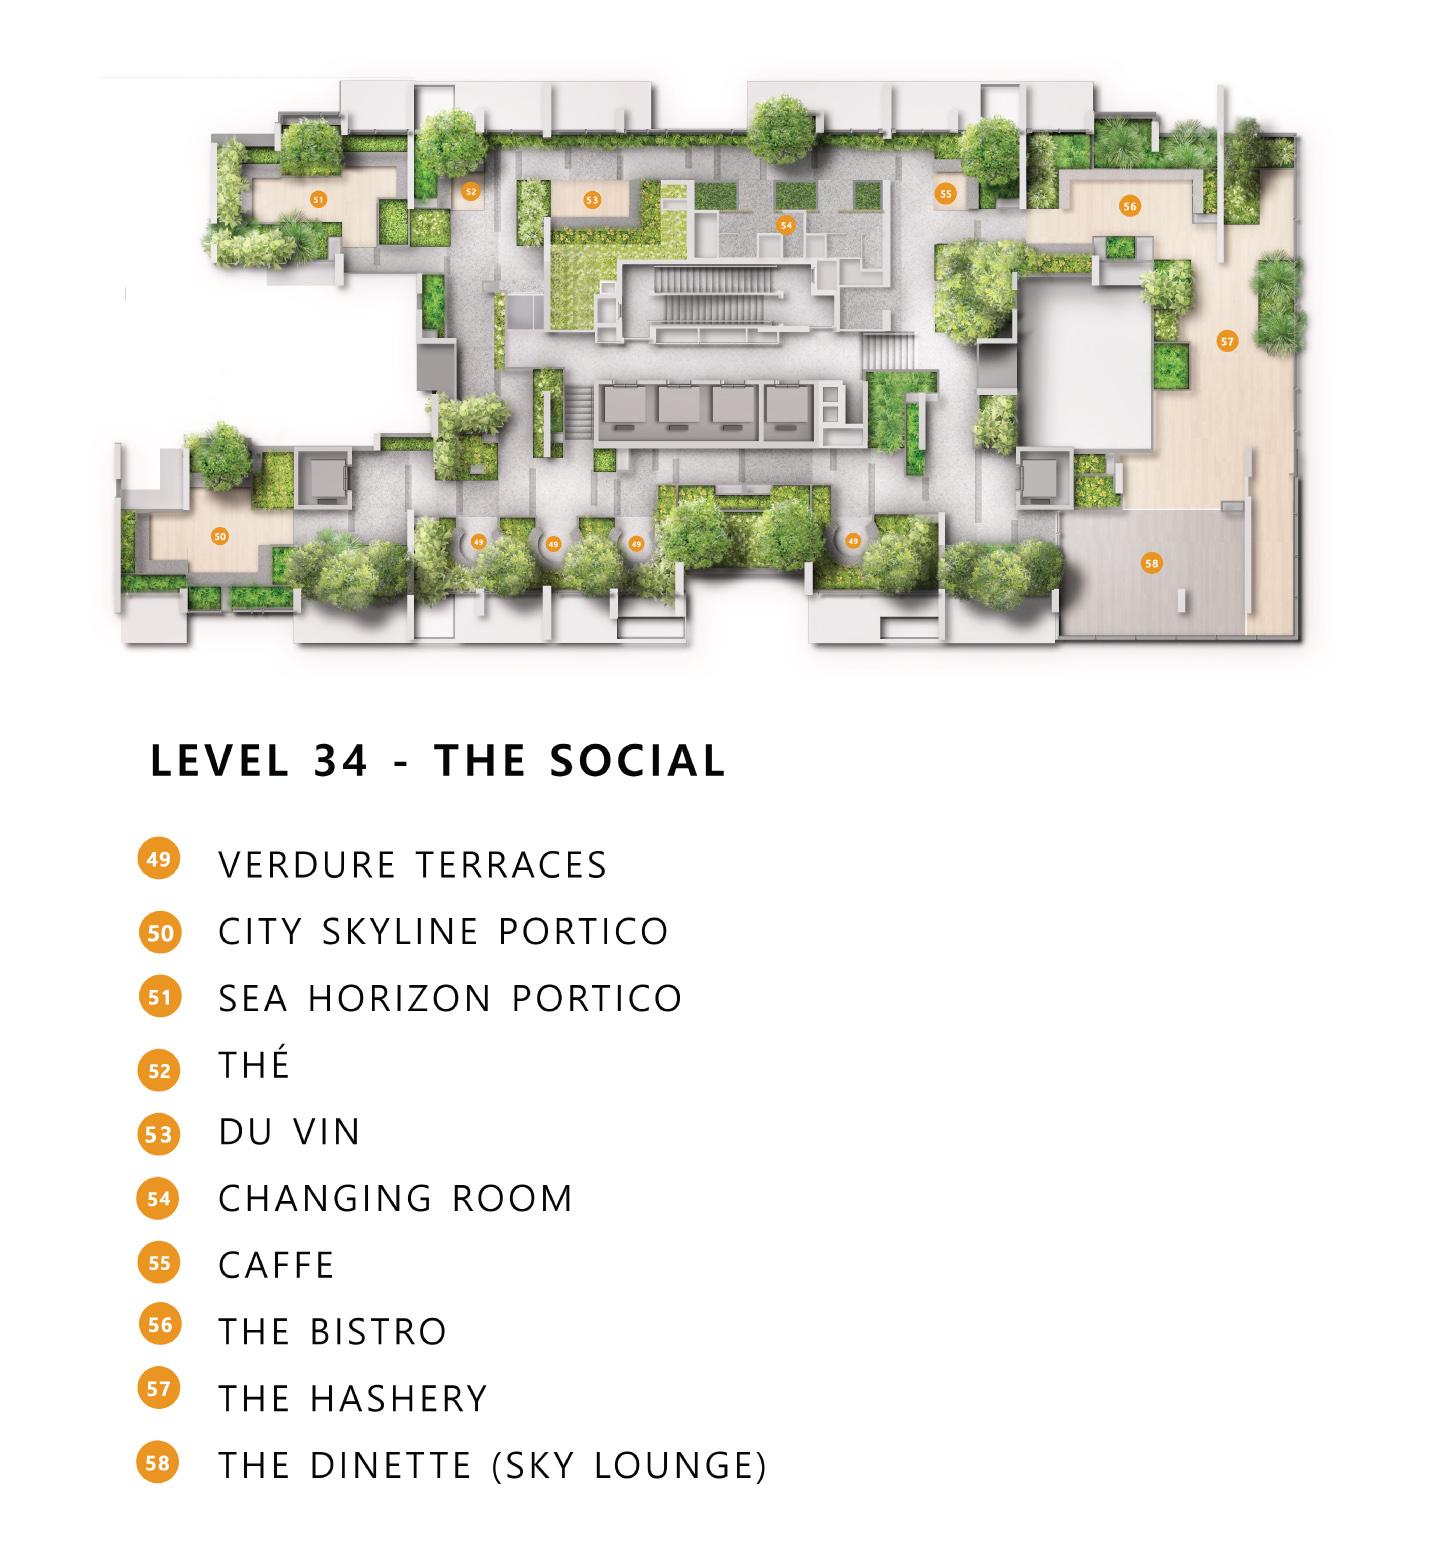 The-Landmark-new-condo-Singapore-site-plan-34th-floor.jpg